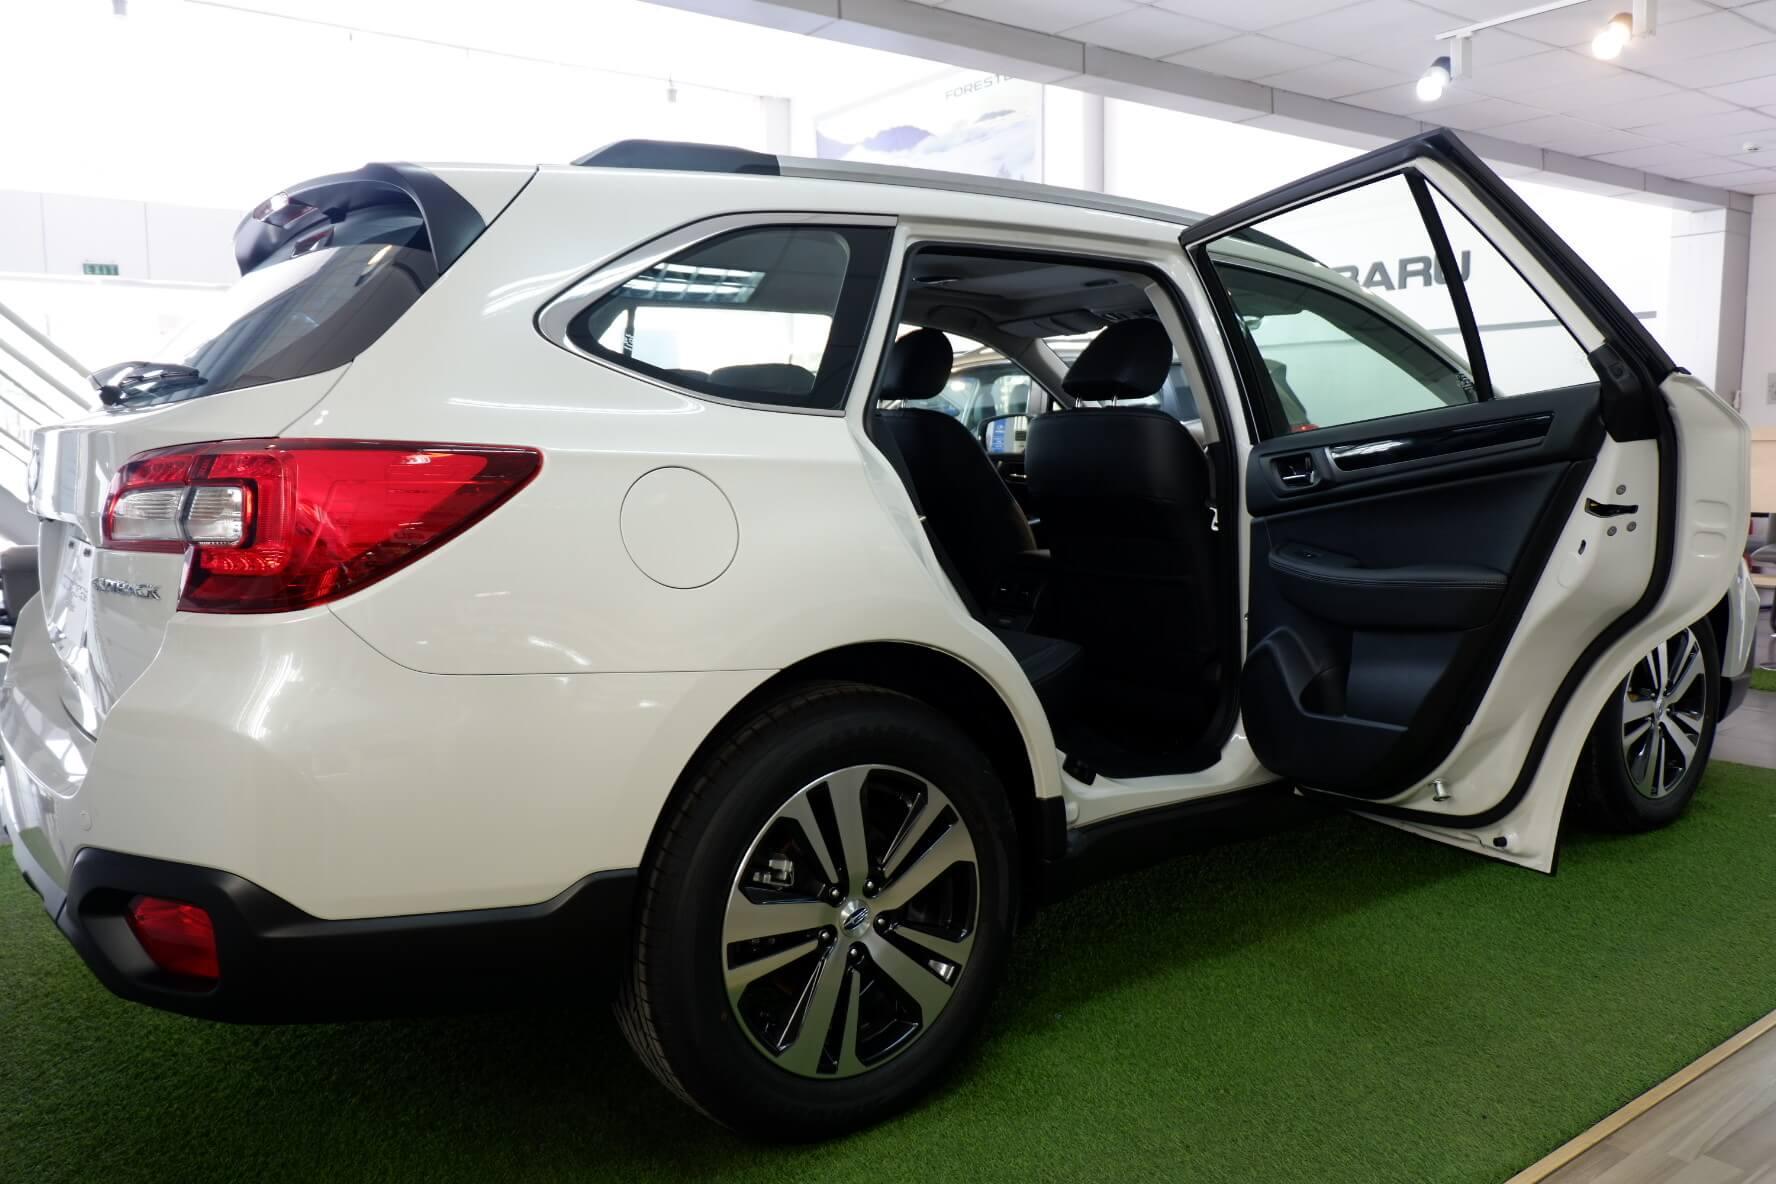 Giá xe Subaru Outback Eyesight 2021 12